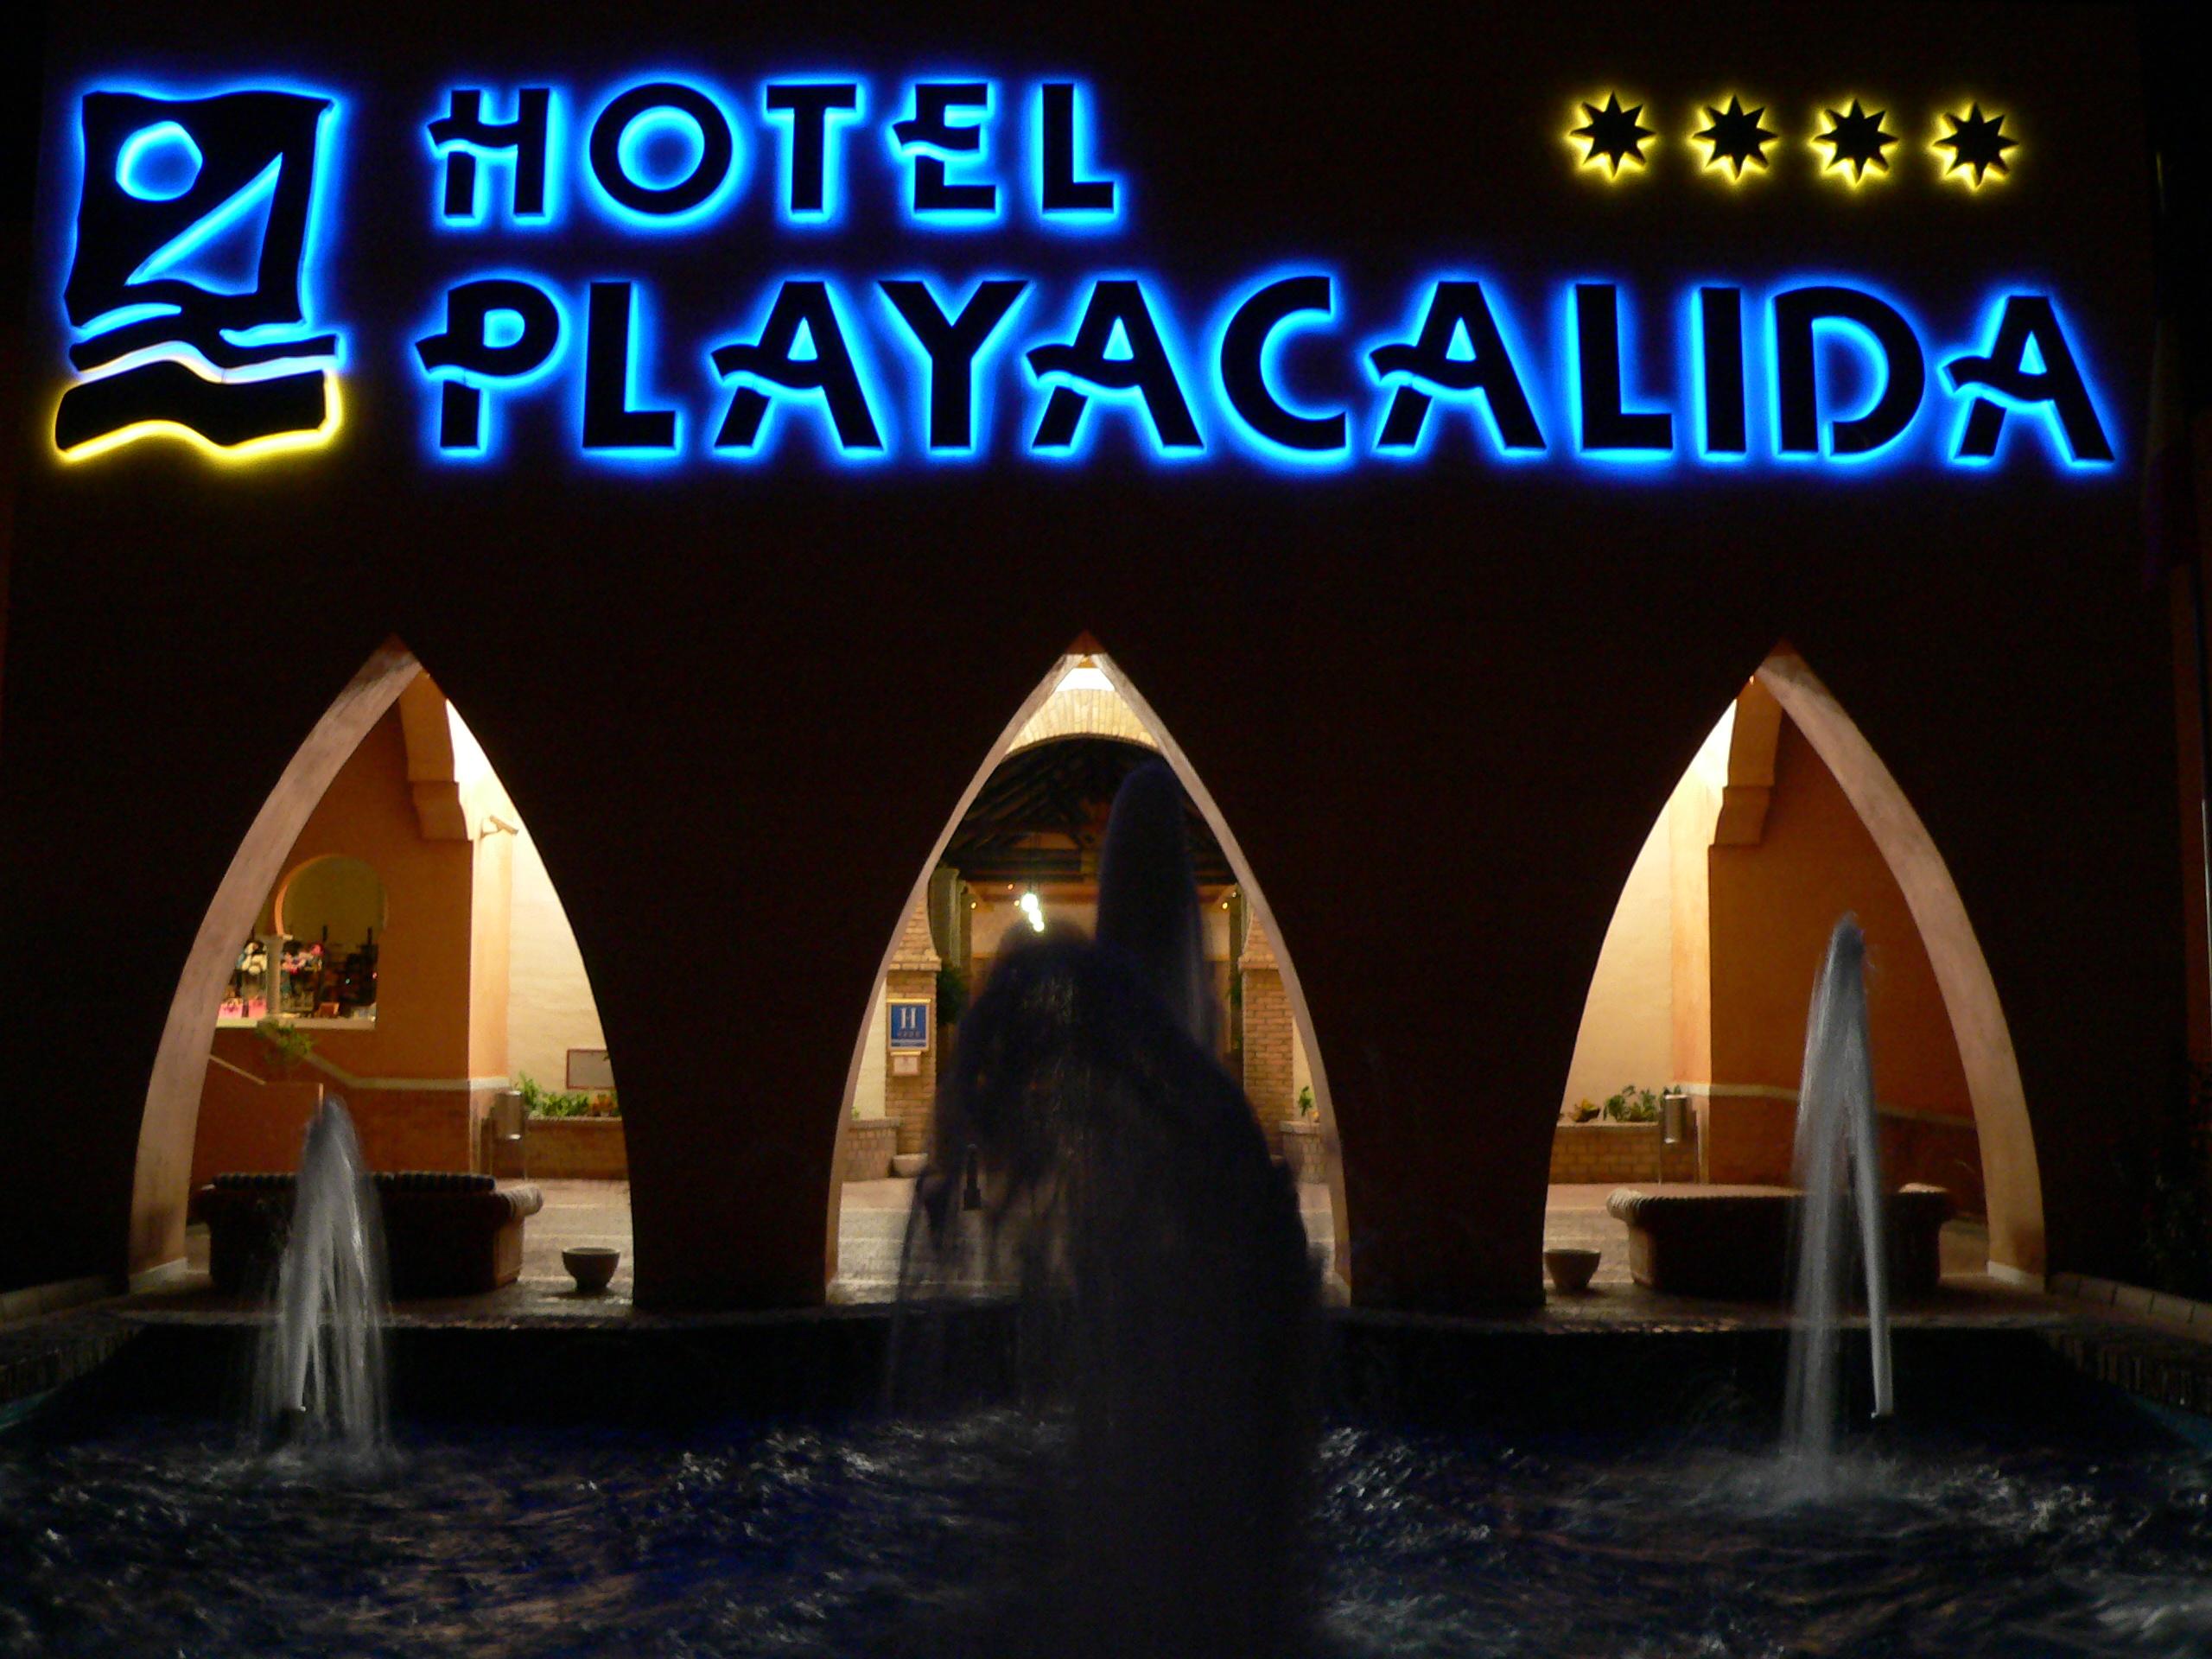 Foto playa Cabria. Hotel Playacalida entrence by night.